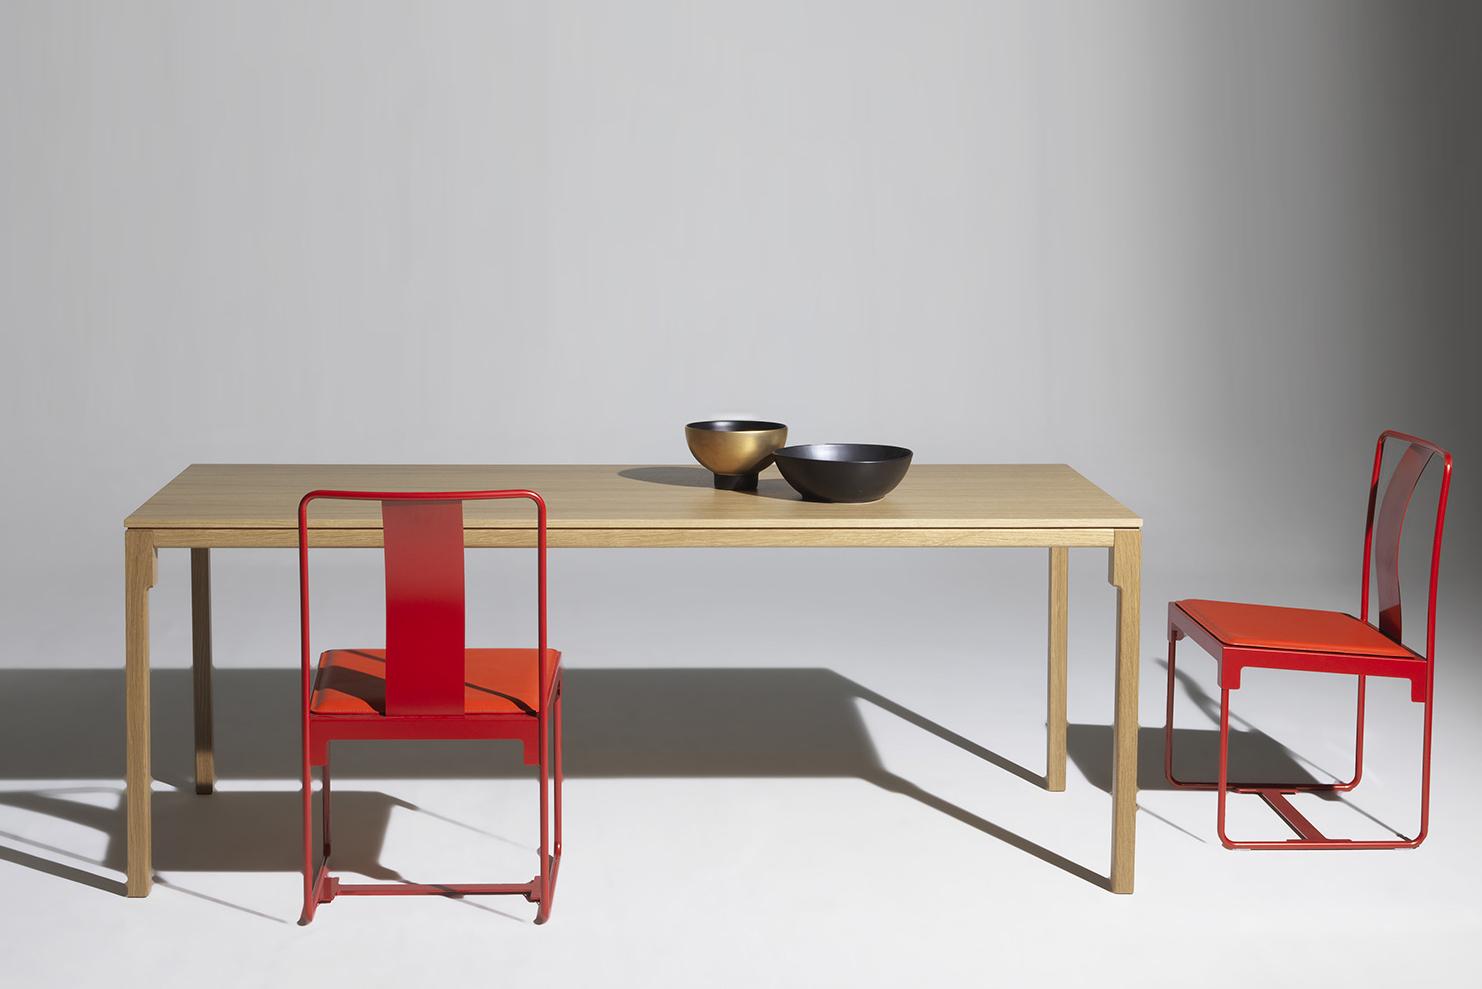 konstantin-grcic-driade-salone-del-mobile-milan-design-week-designboom-1800.jpg